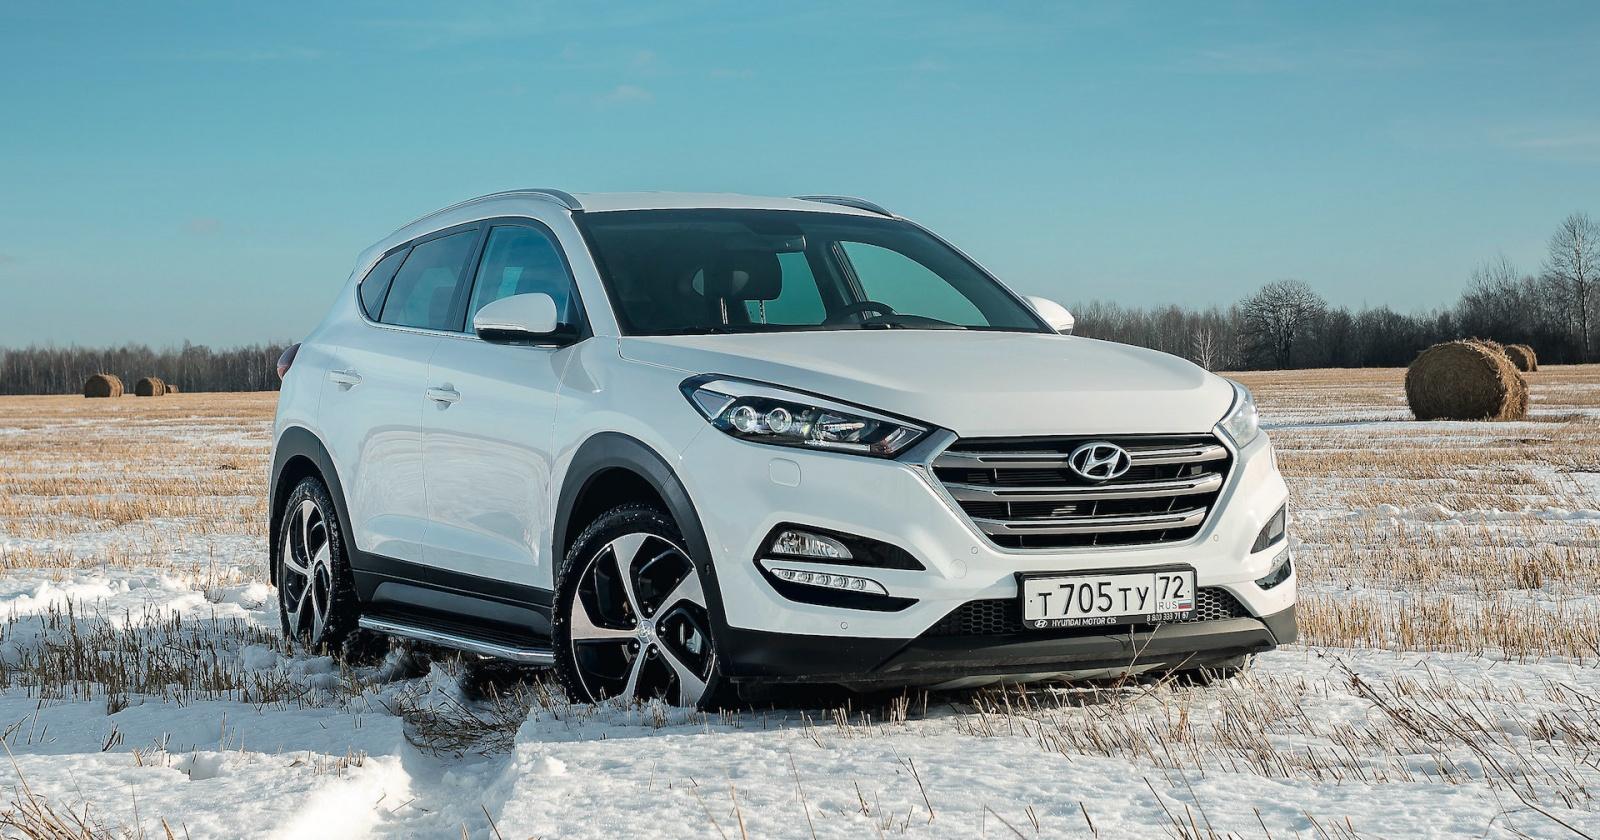 Нетрадиционная ориентация: тест Hyundai Tucson